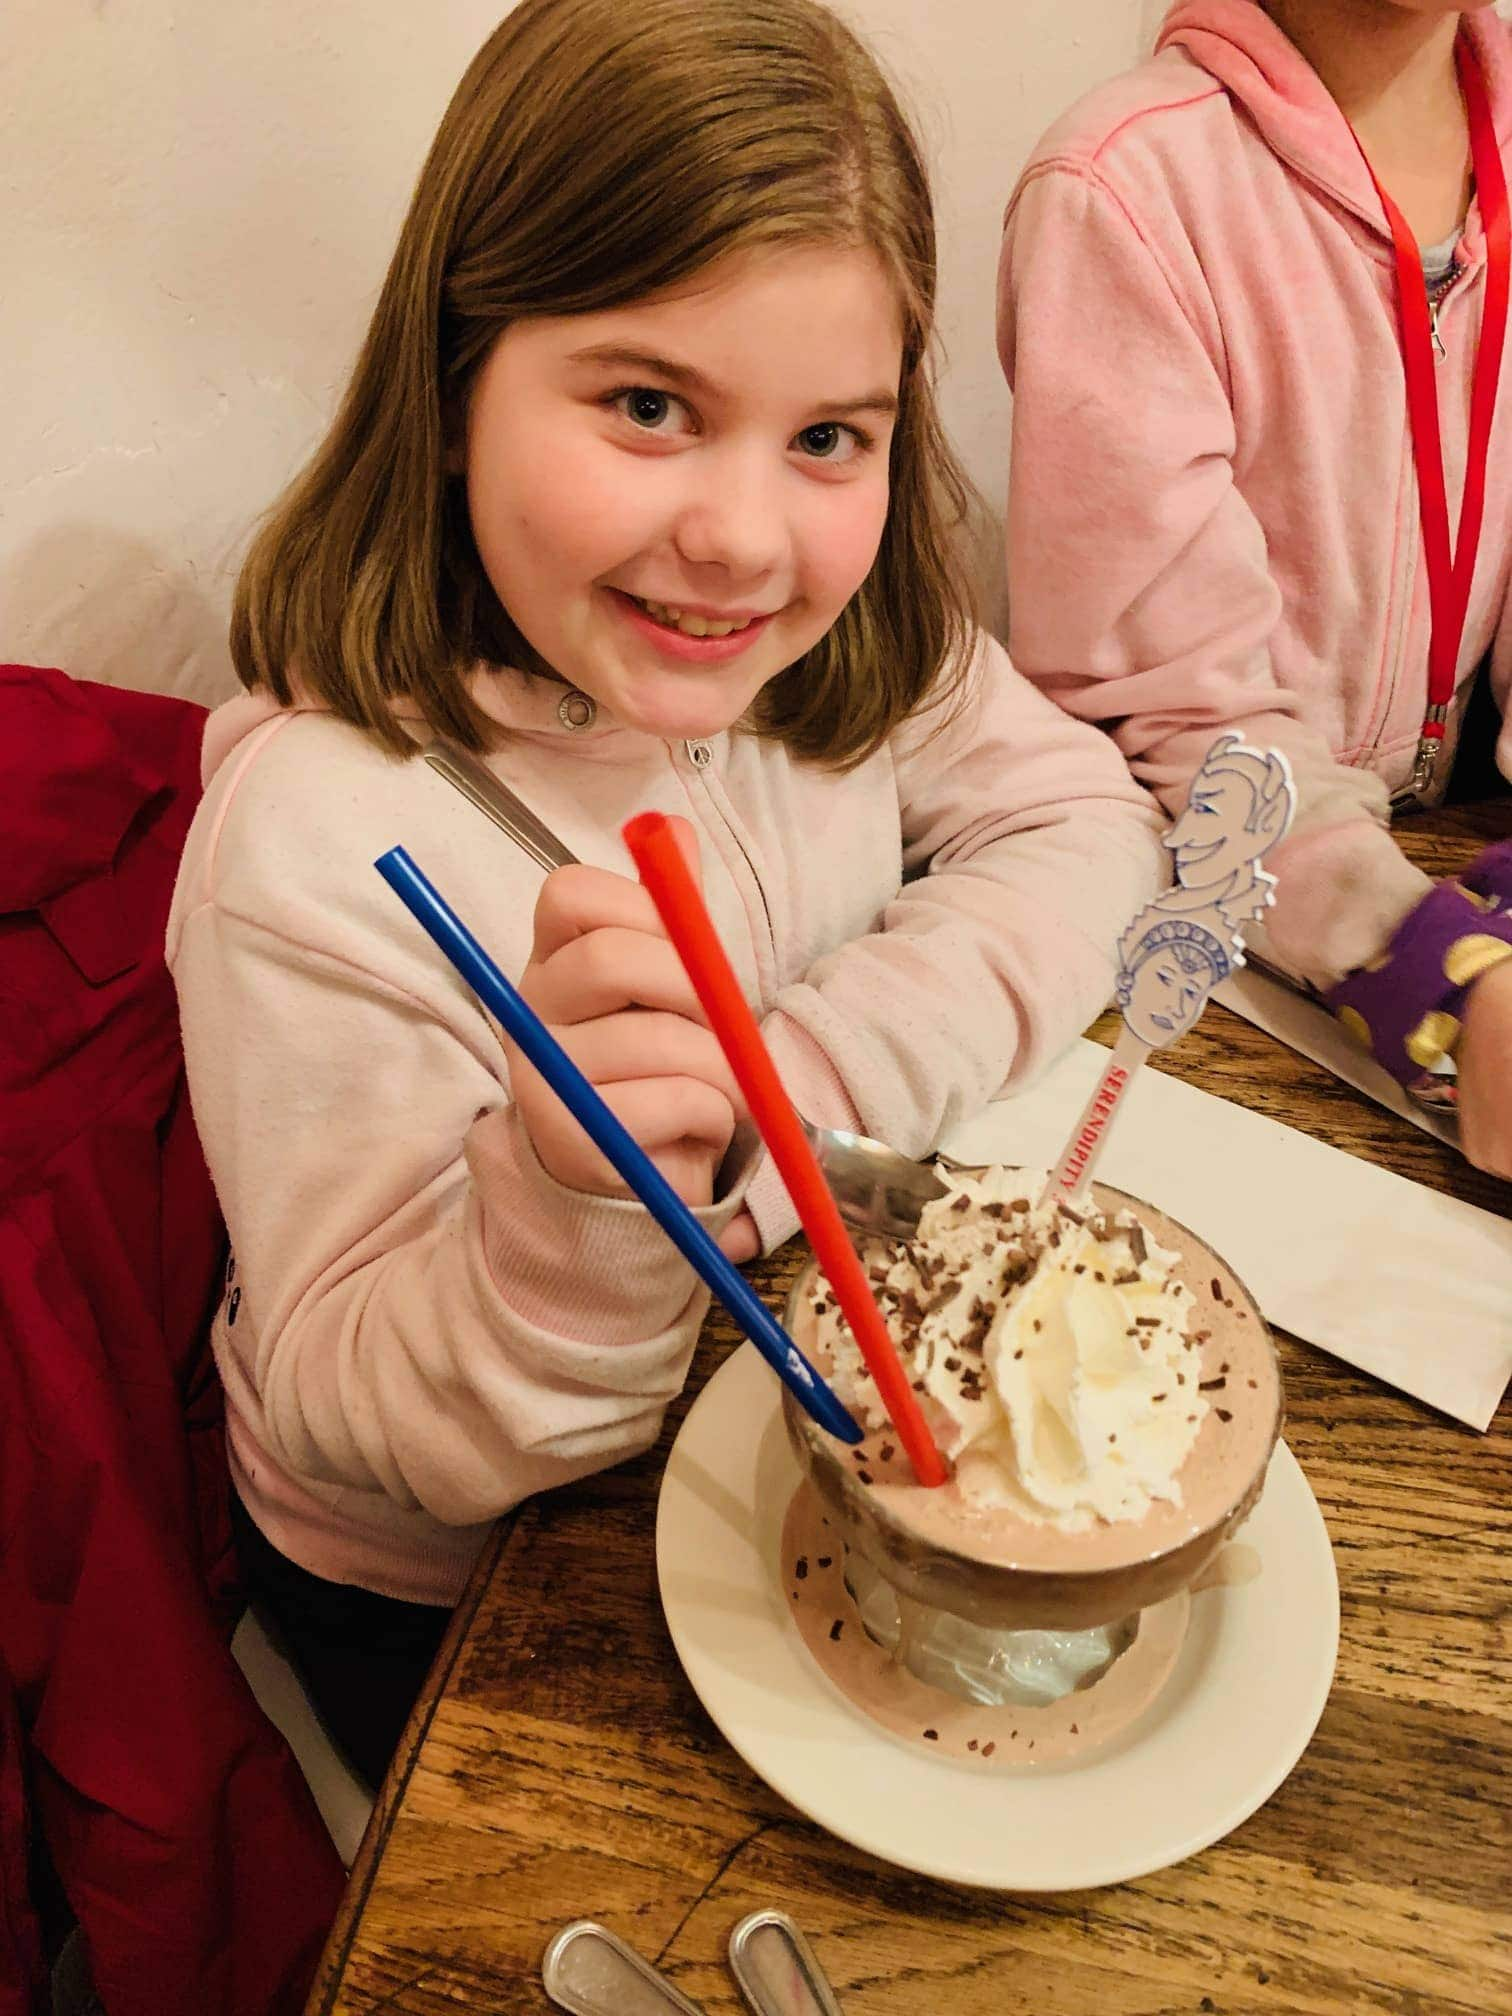 Brooke with a milkshake